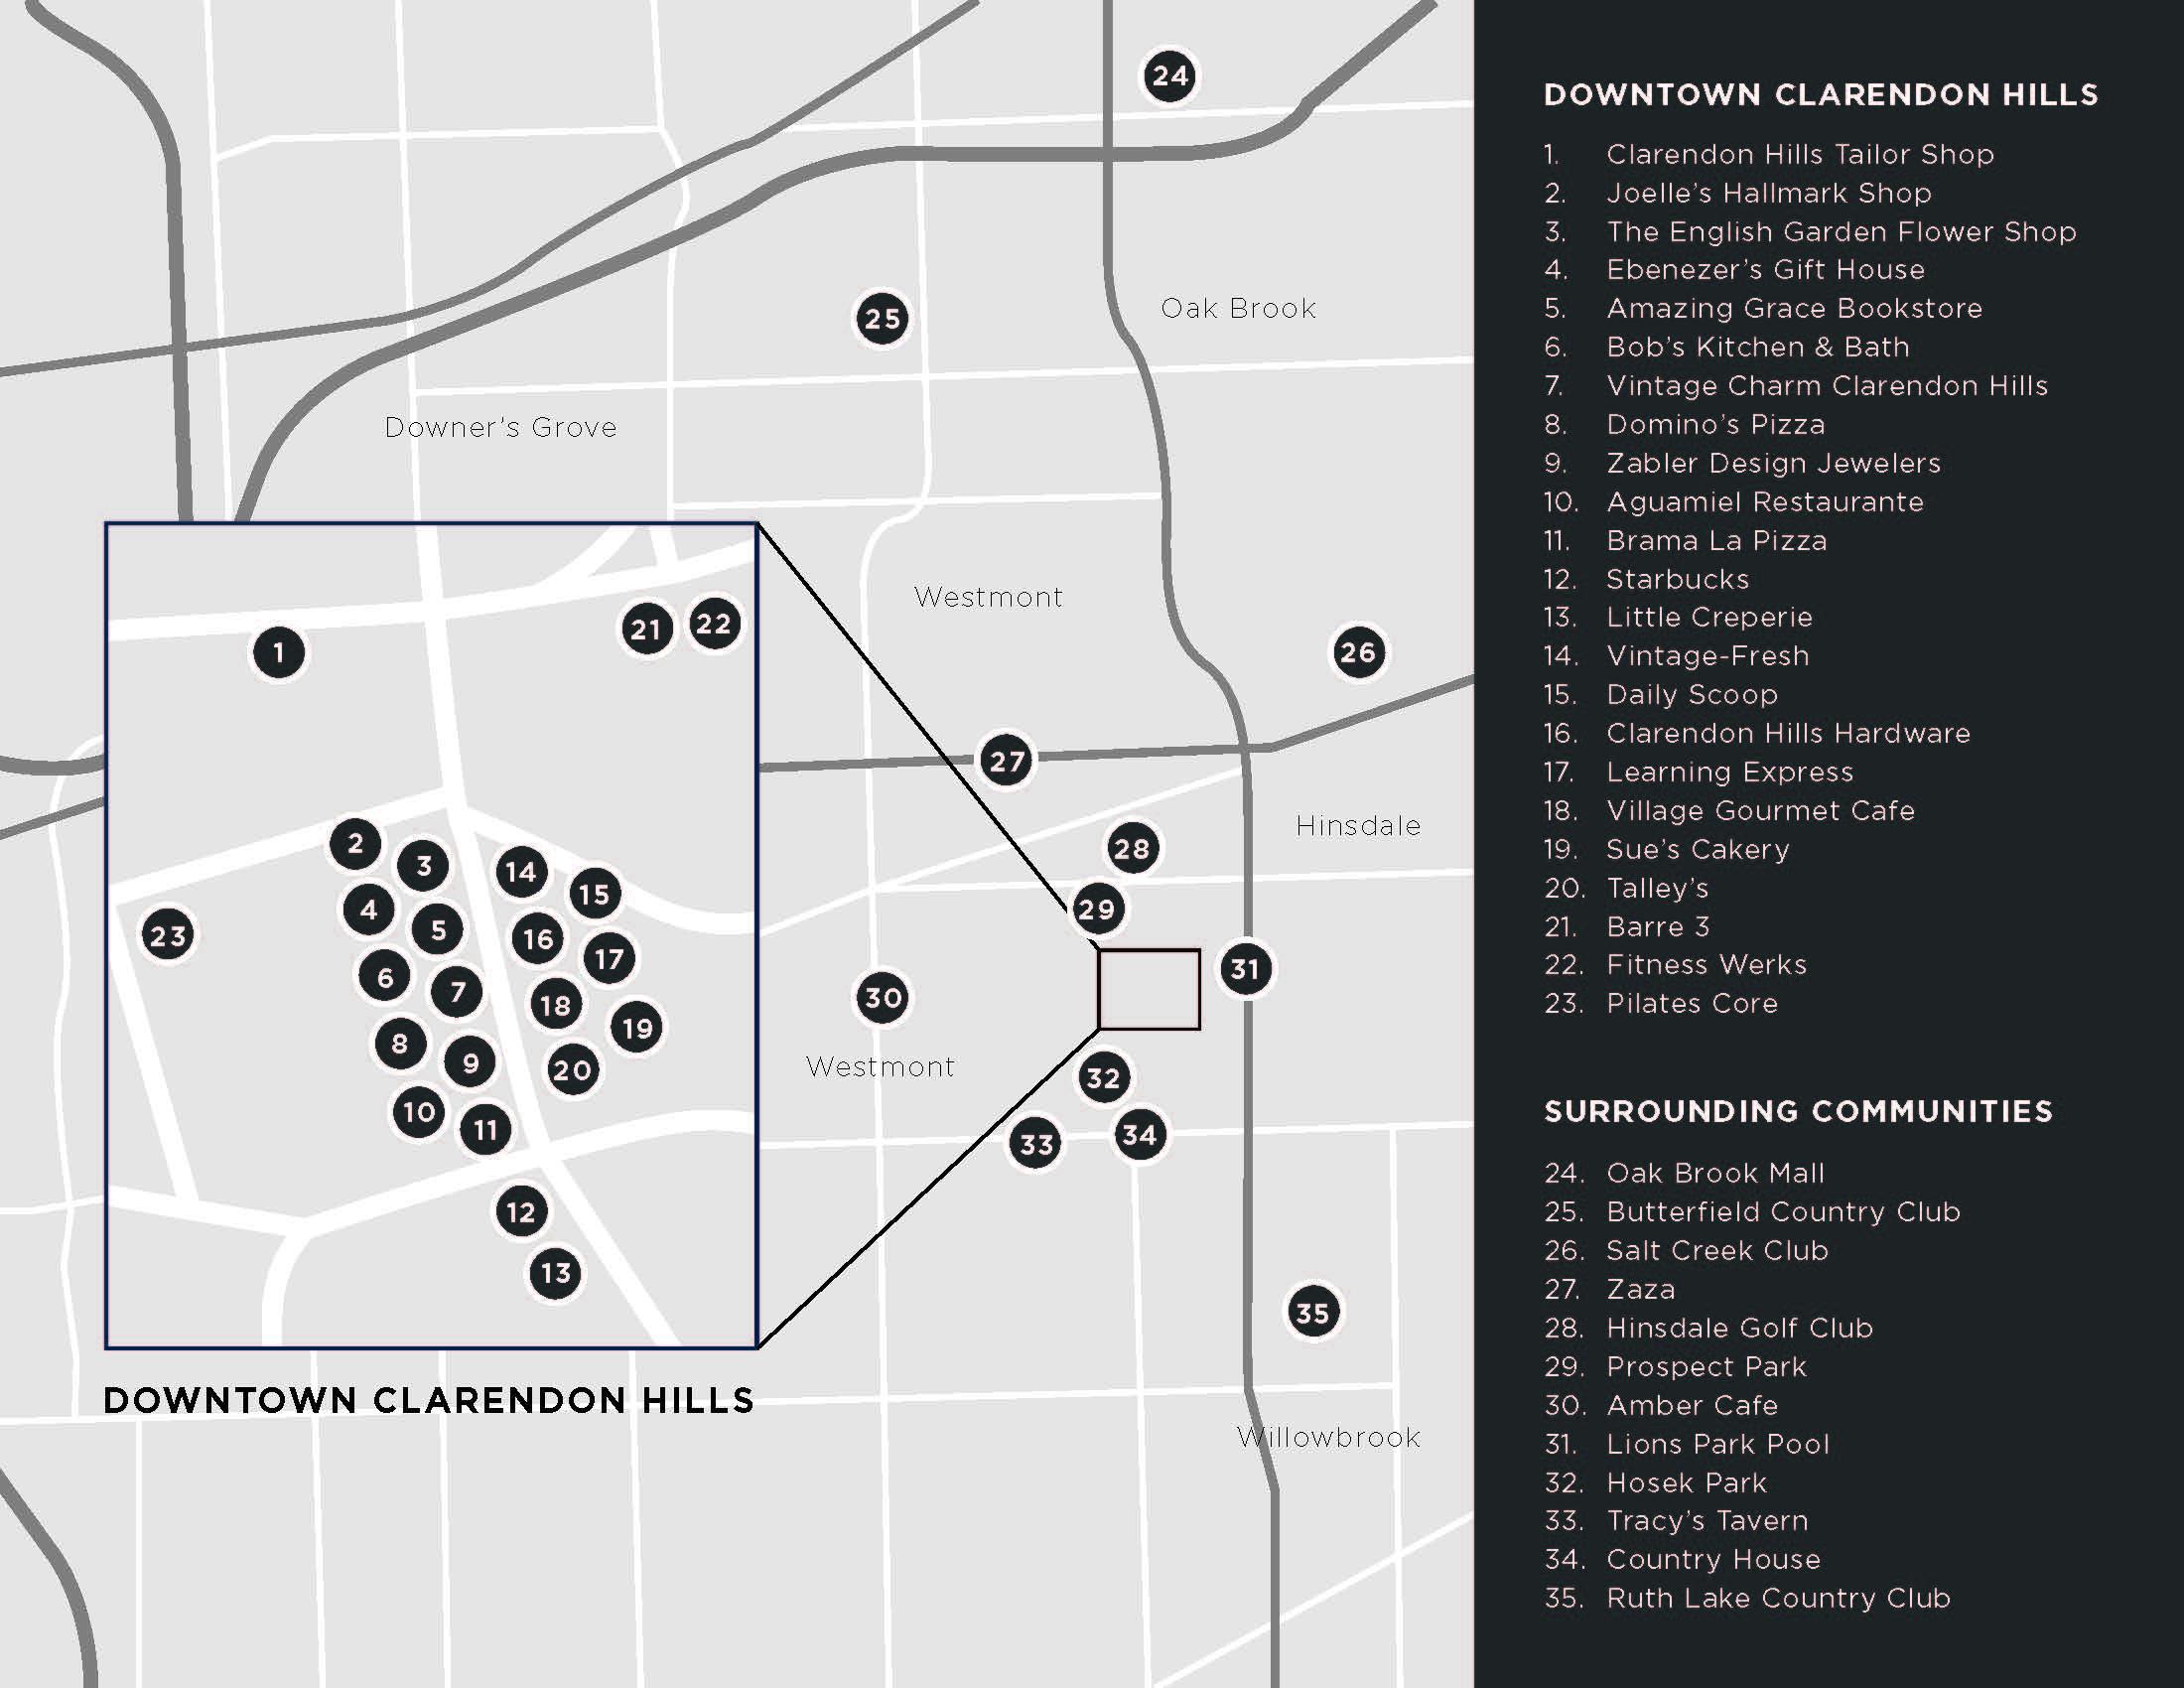 229Park_Map.jpg